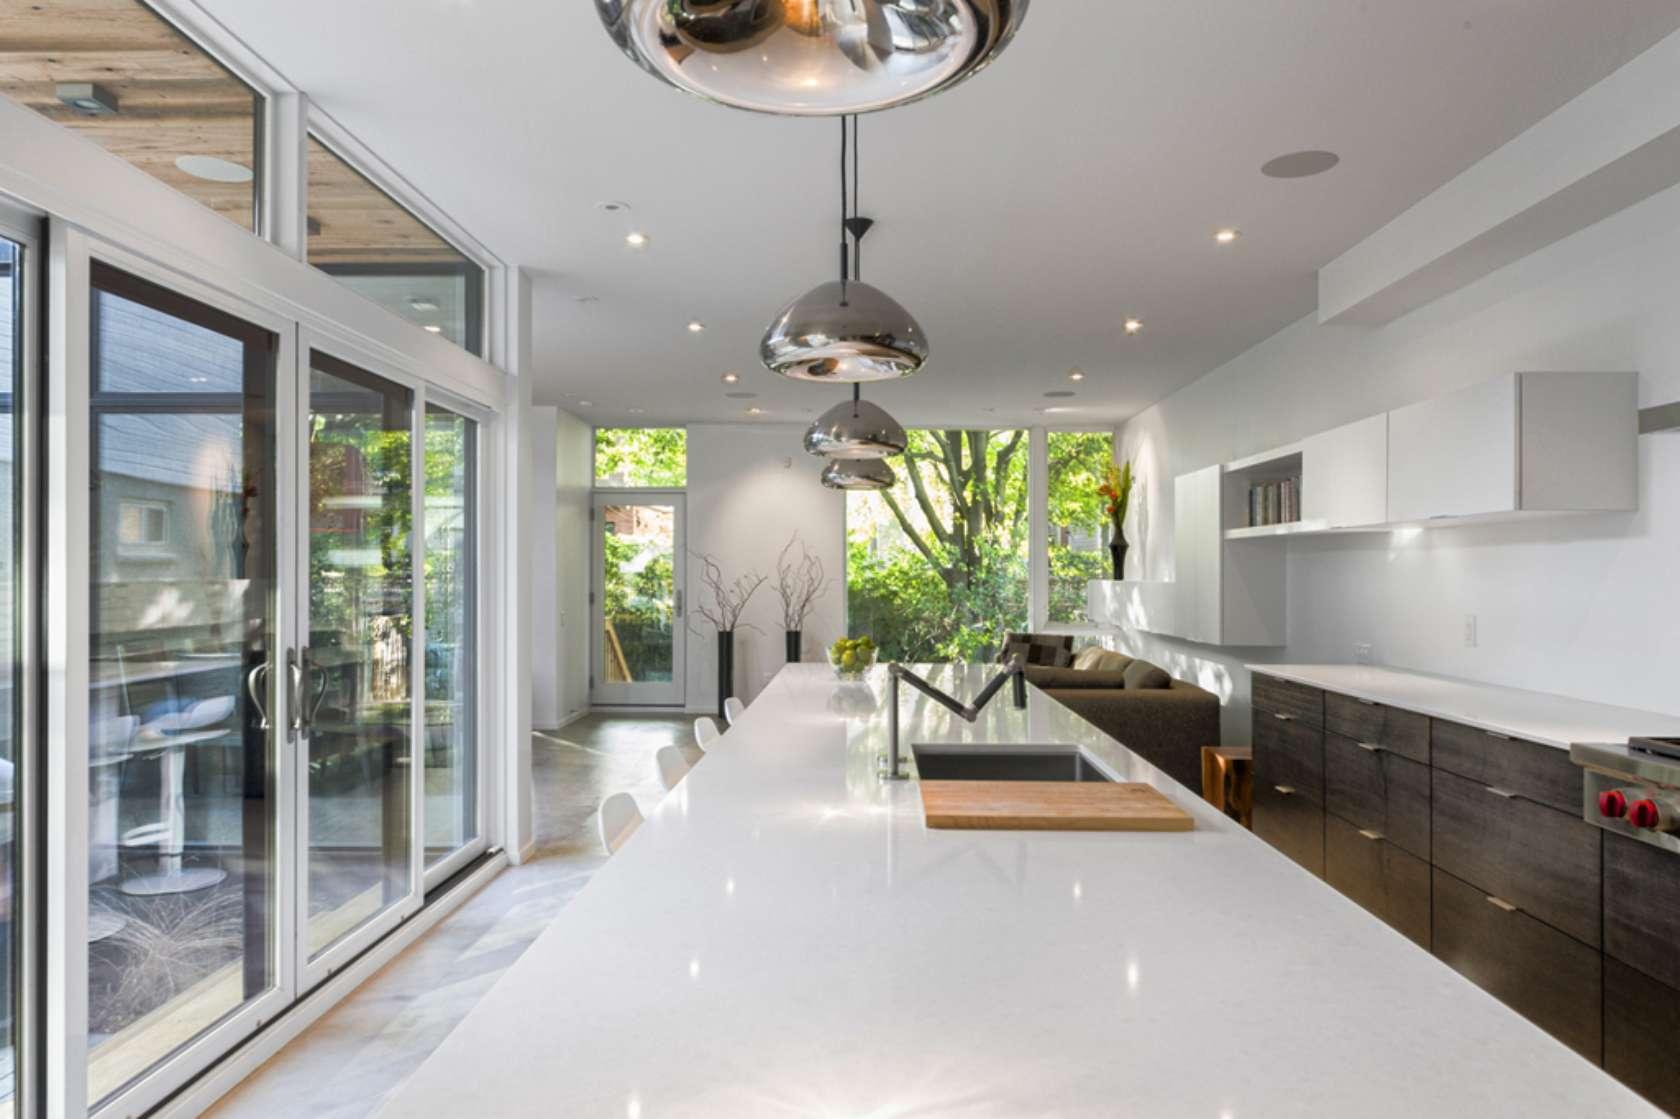 diseo de isla de cocina lineal con grandes y modernas lmparas de techo cromadas with lamparas cocina modernas